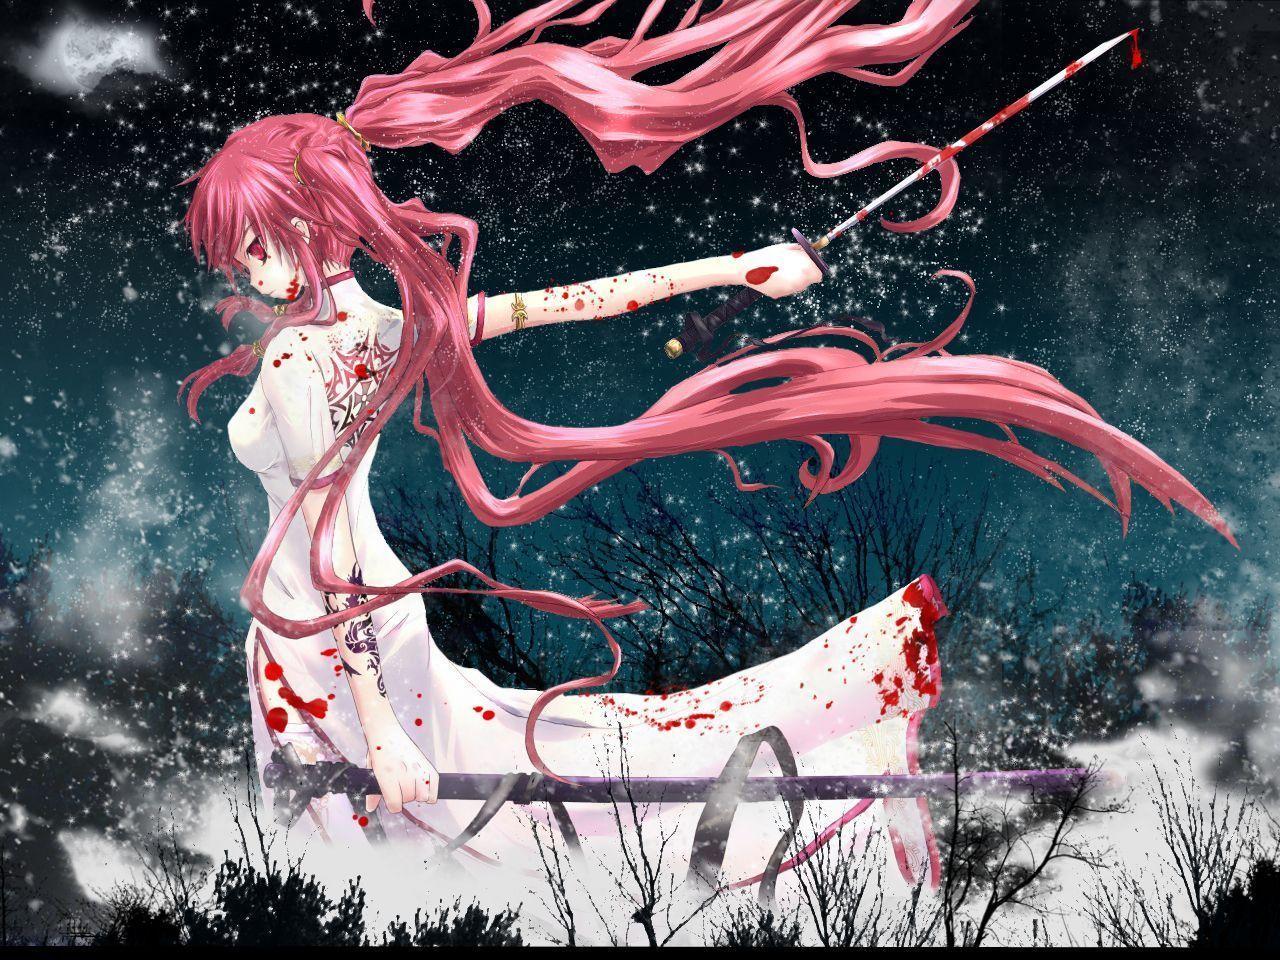 blood_anime_girls_desktop_1280x960_wallpaper-394651.jpg